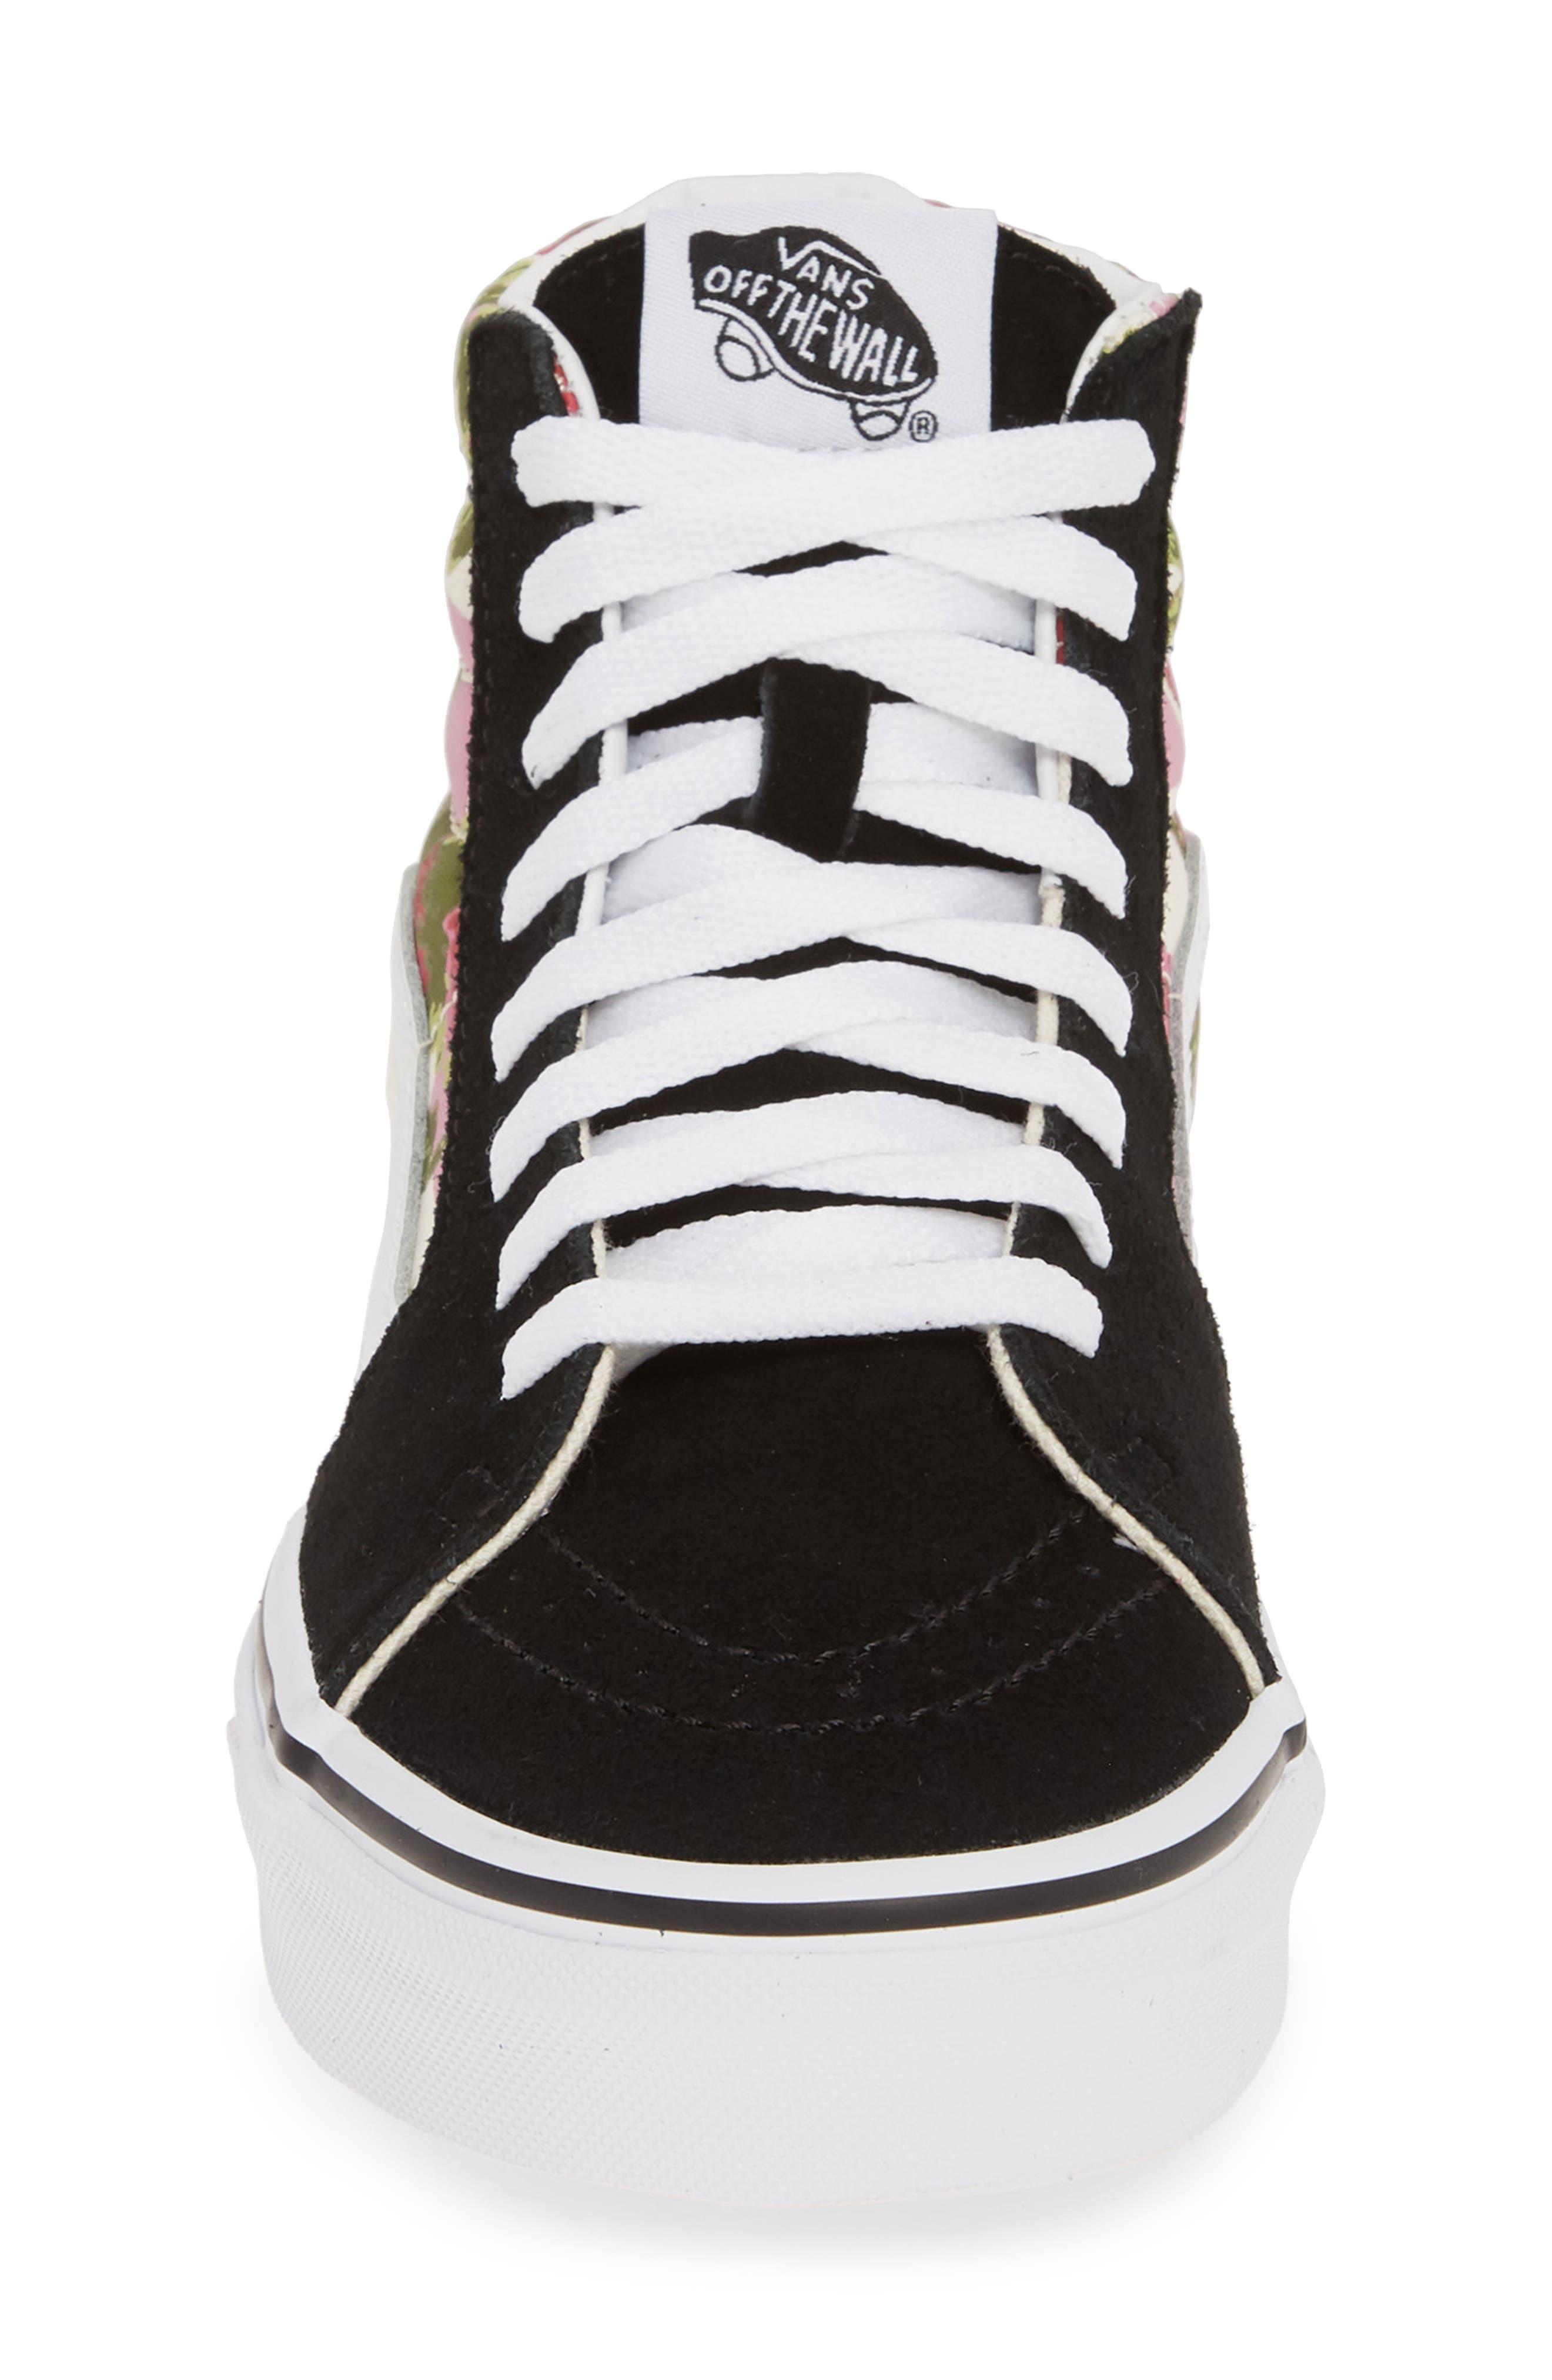 VANS, Sk8-Hi Floral Sneaker, Alternate thumbnail 4, color, FLORAL MULTI/ TRUE WHITE